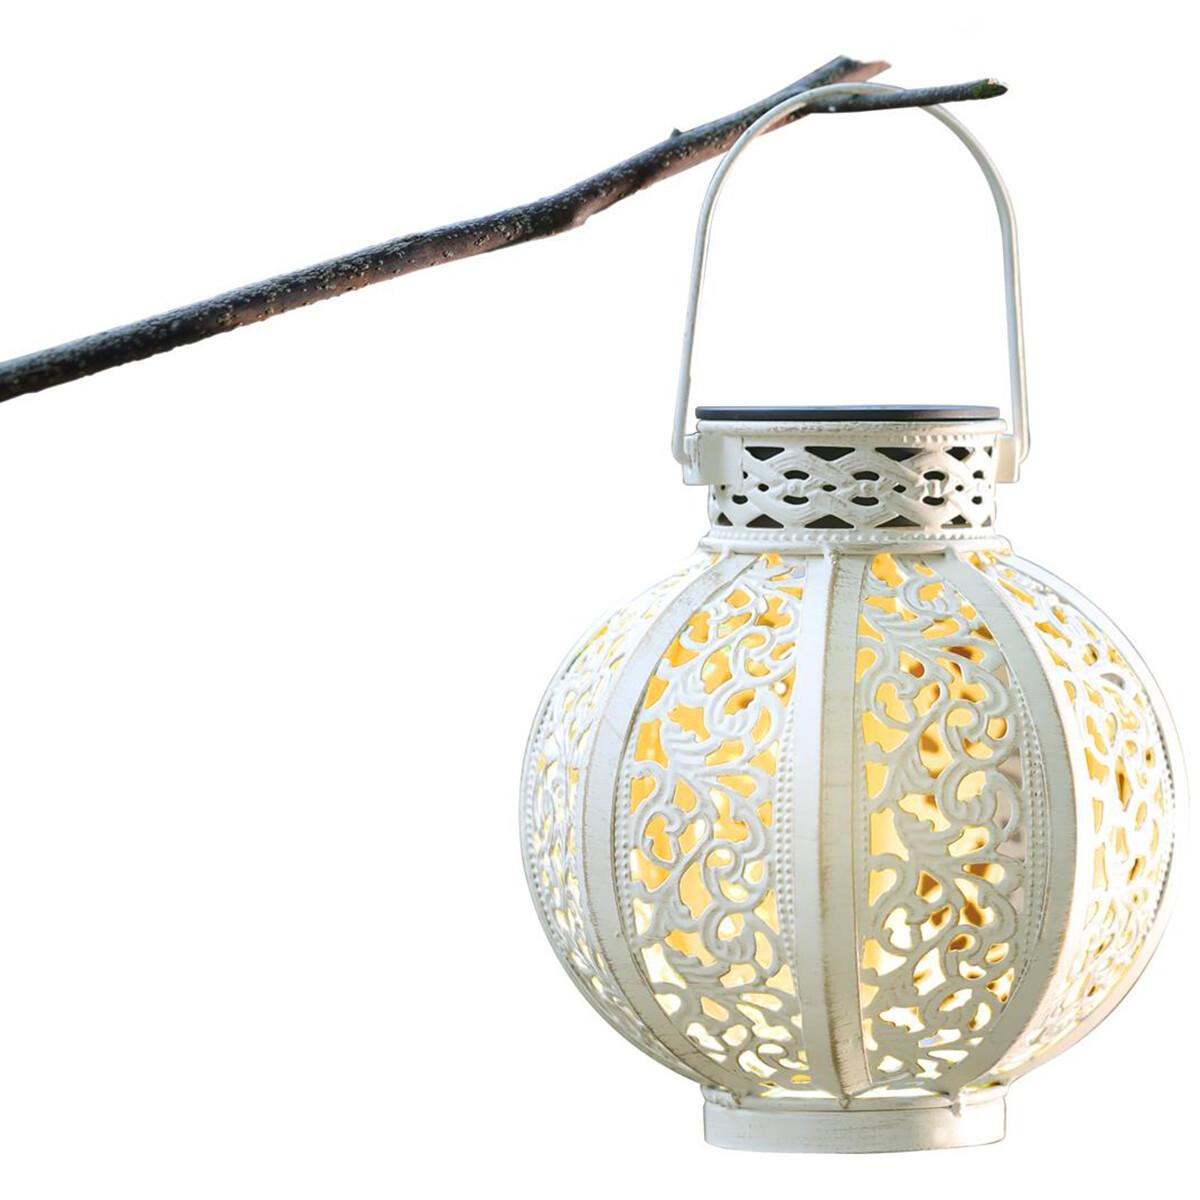 LED Hanglamp met Zonne-energie - Aigi Uki - 0.16W - Warm Wit 3000K - Mat Wit - Kunststof